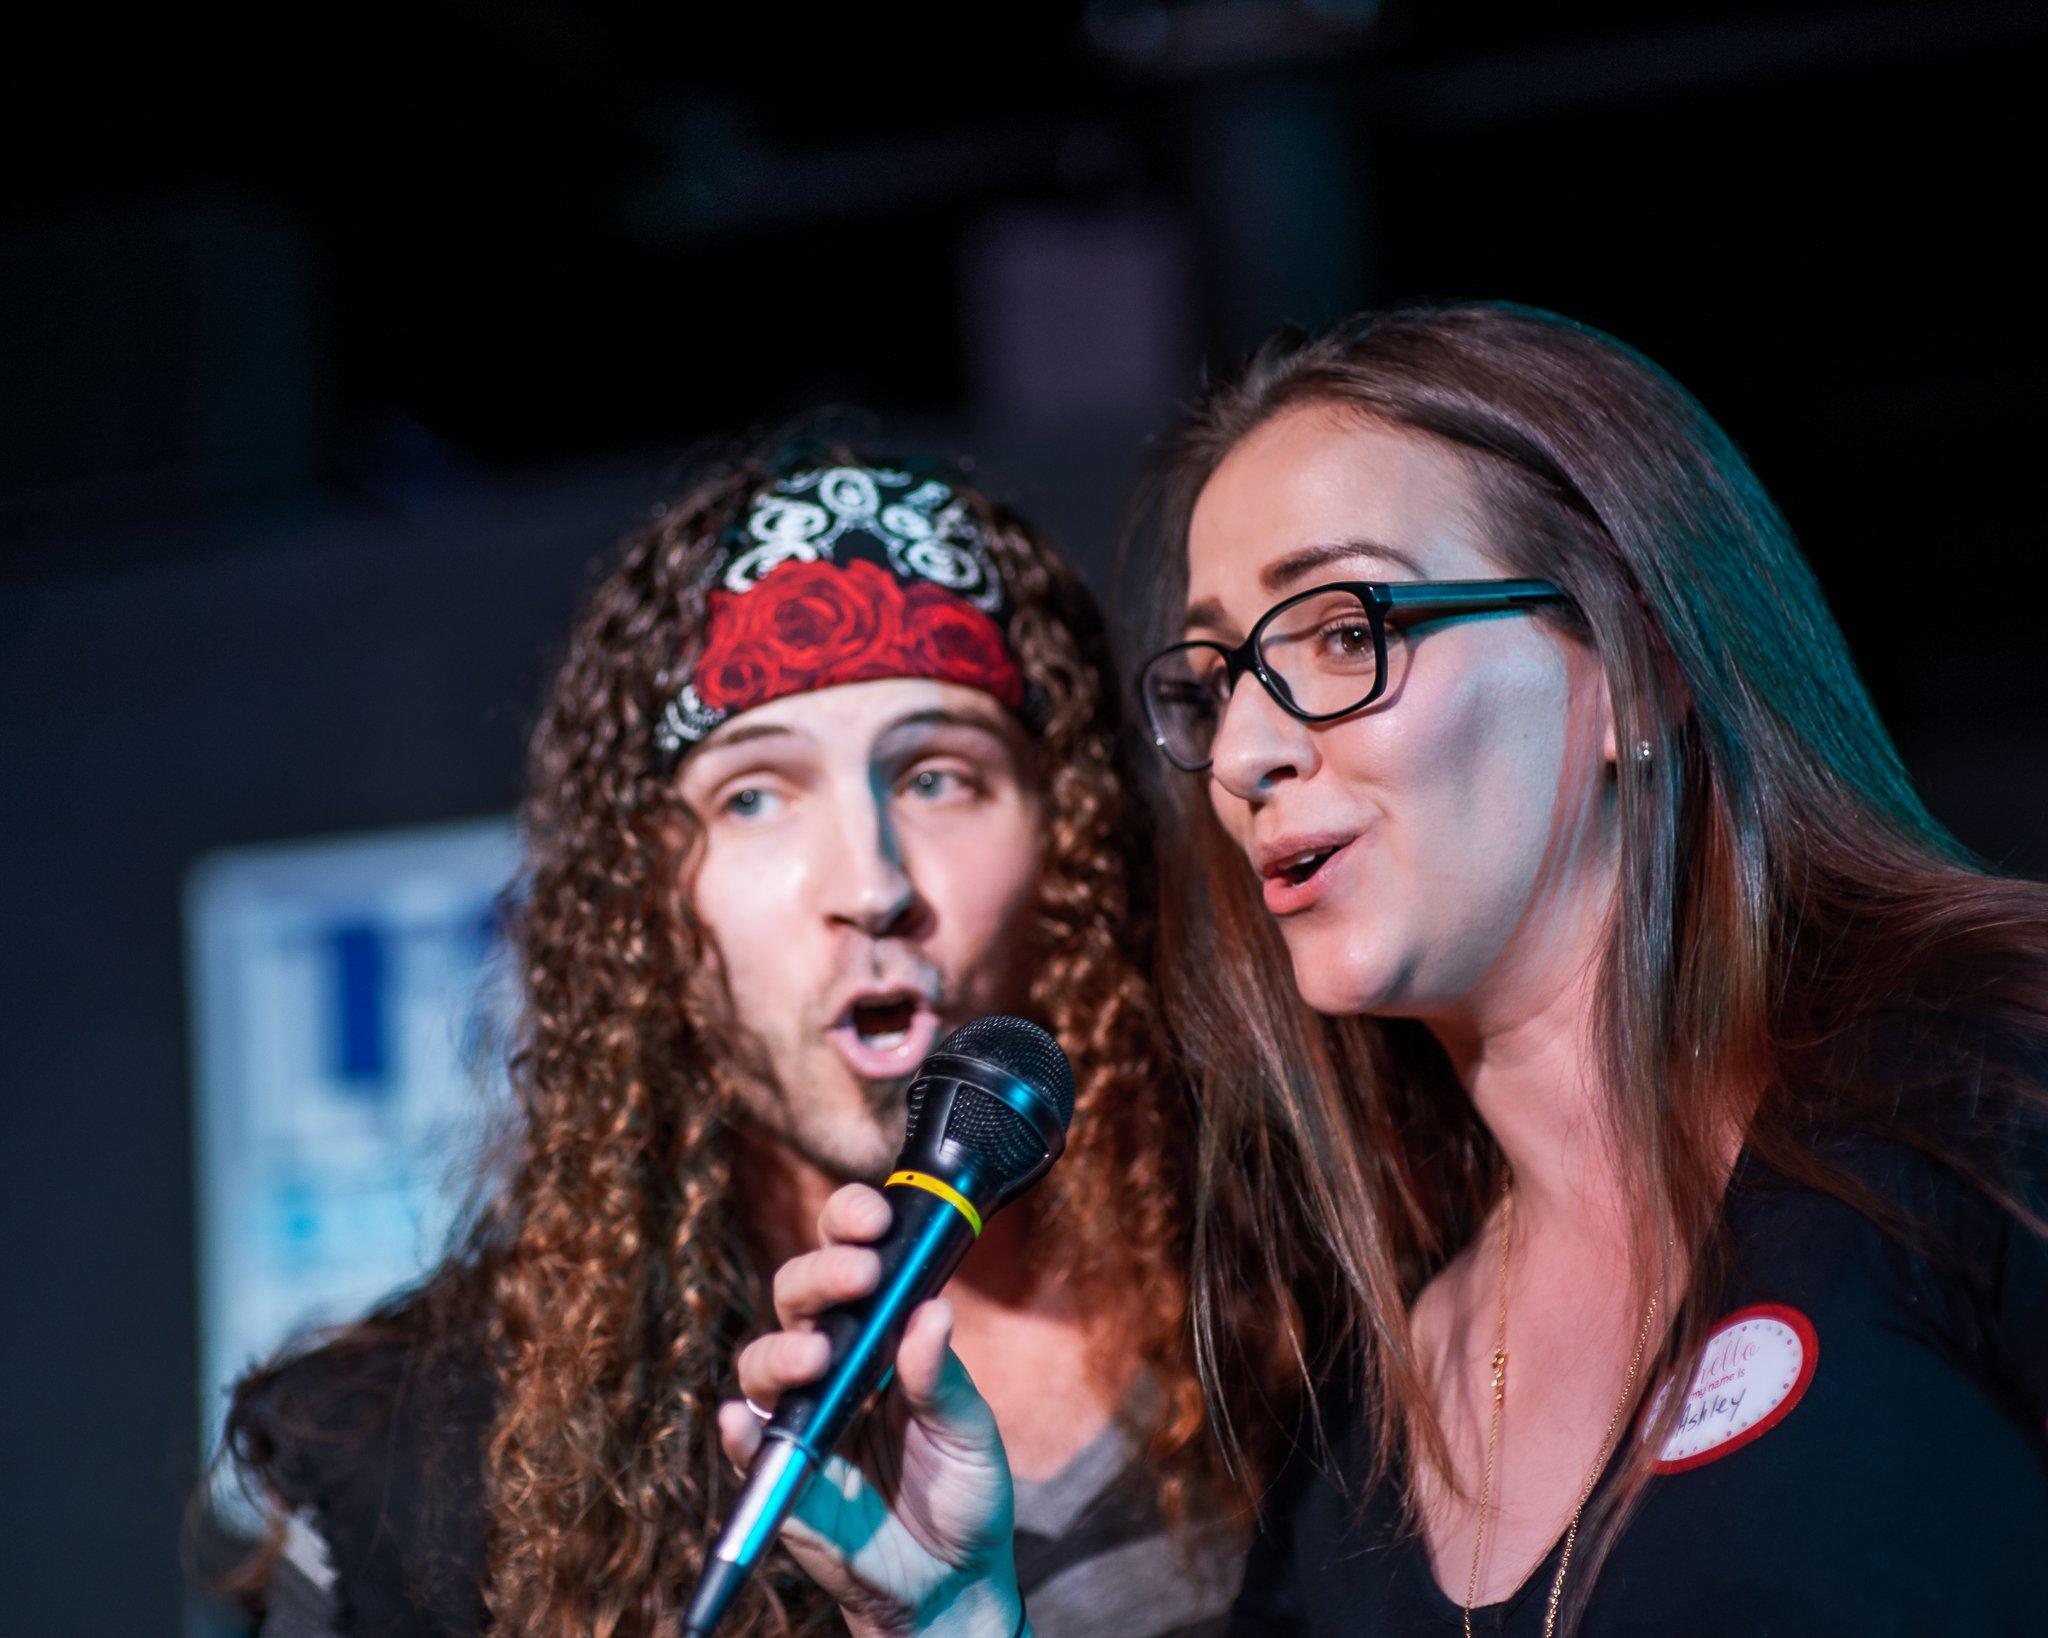 Cedar Rapids city council member Ashley Vanorny singing at State Representative Liz Bennett's Celebrity Karaoke Night Fundraiser